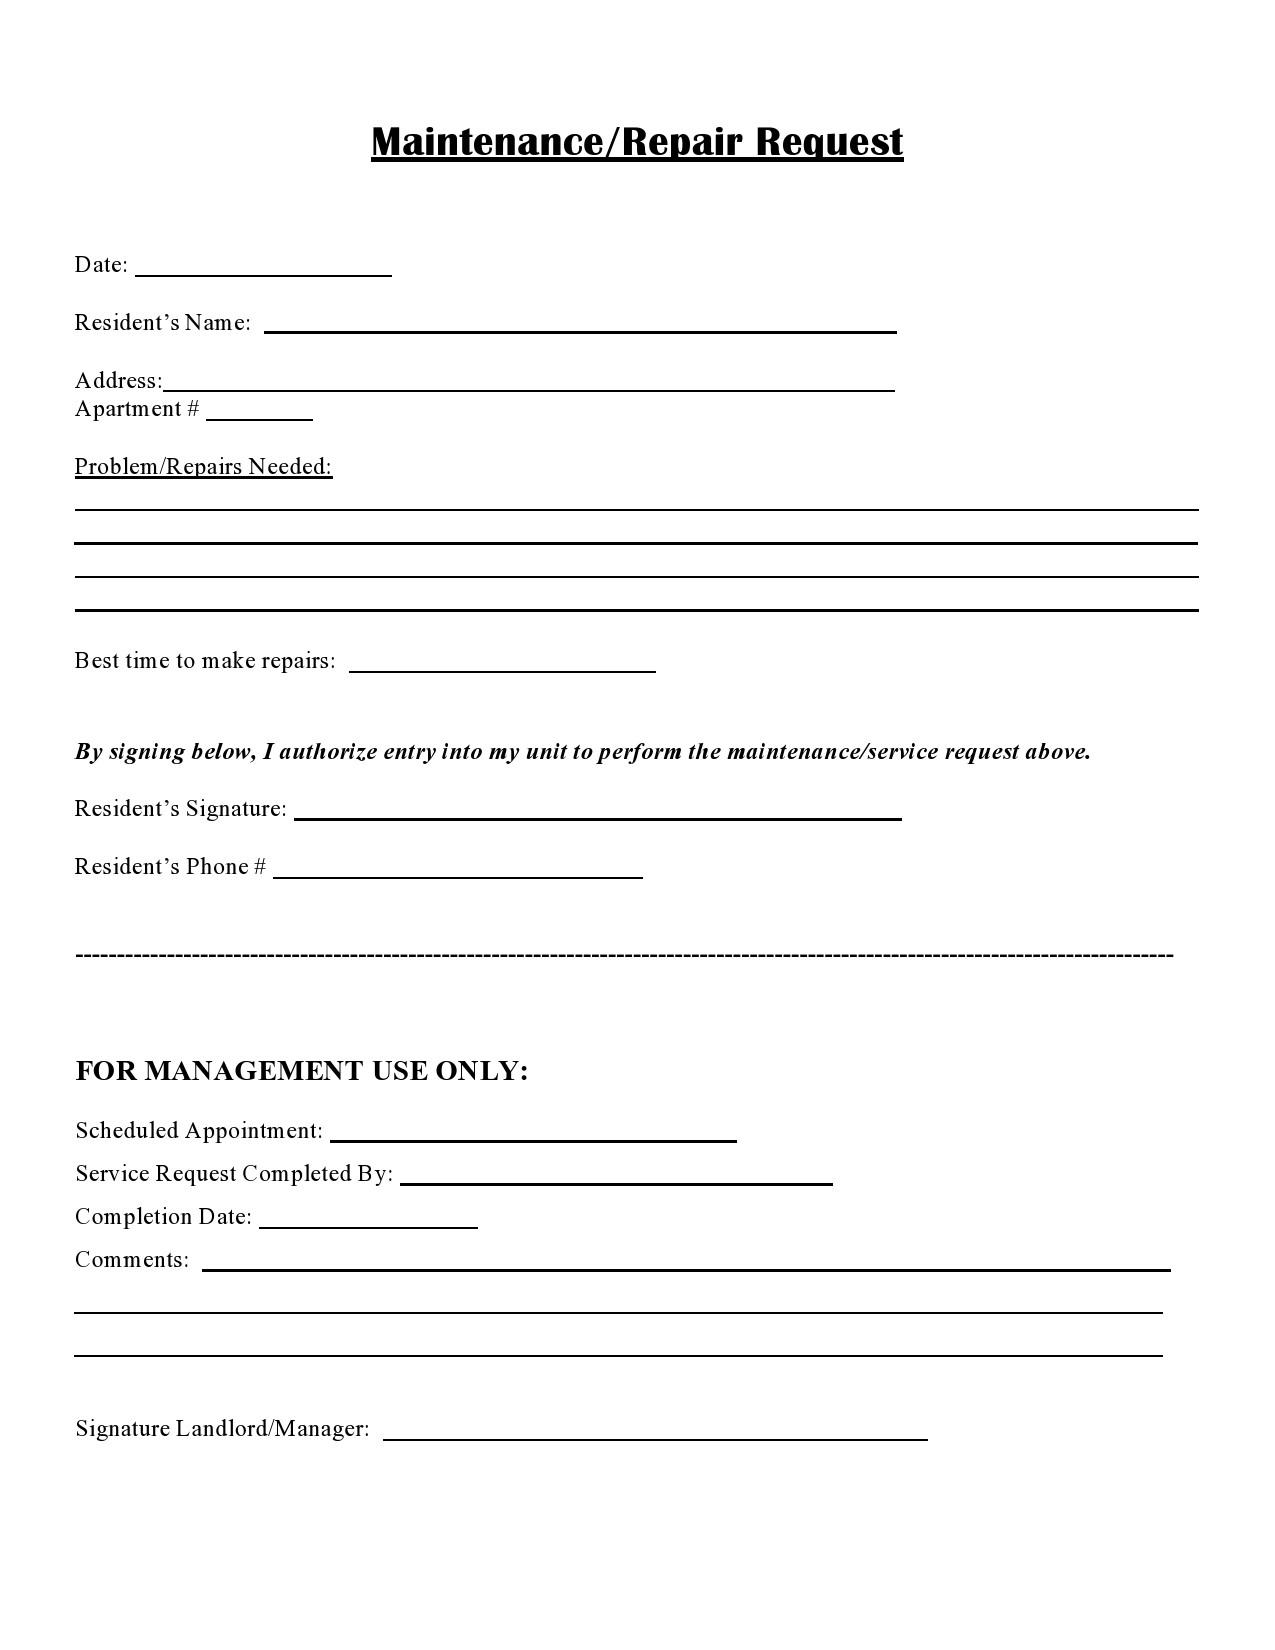 Maintenance or custodial work request. 54 Maintenance Request Form Templates Free Á… Templatelab